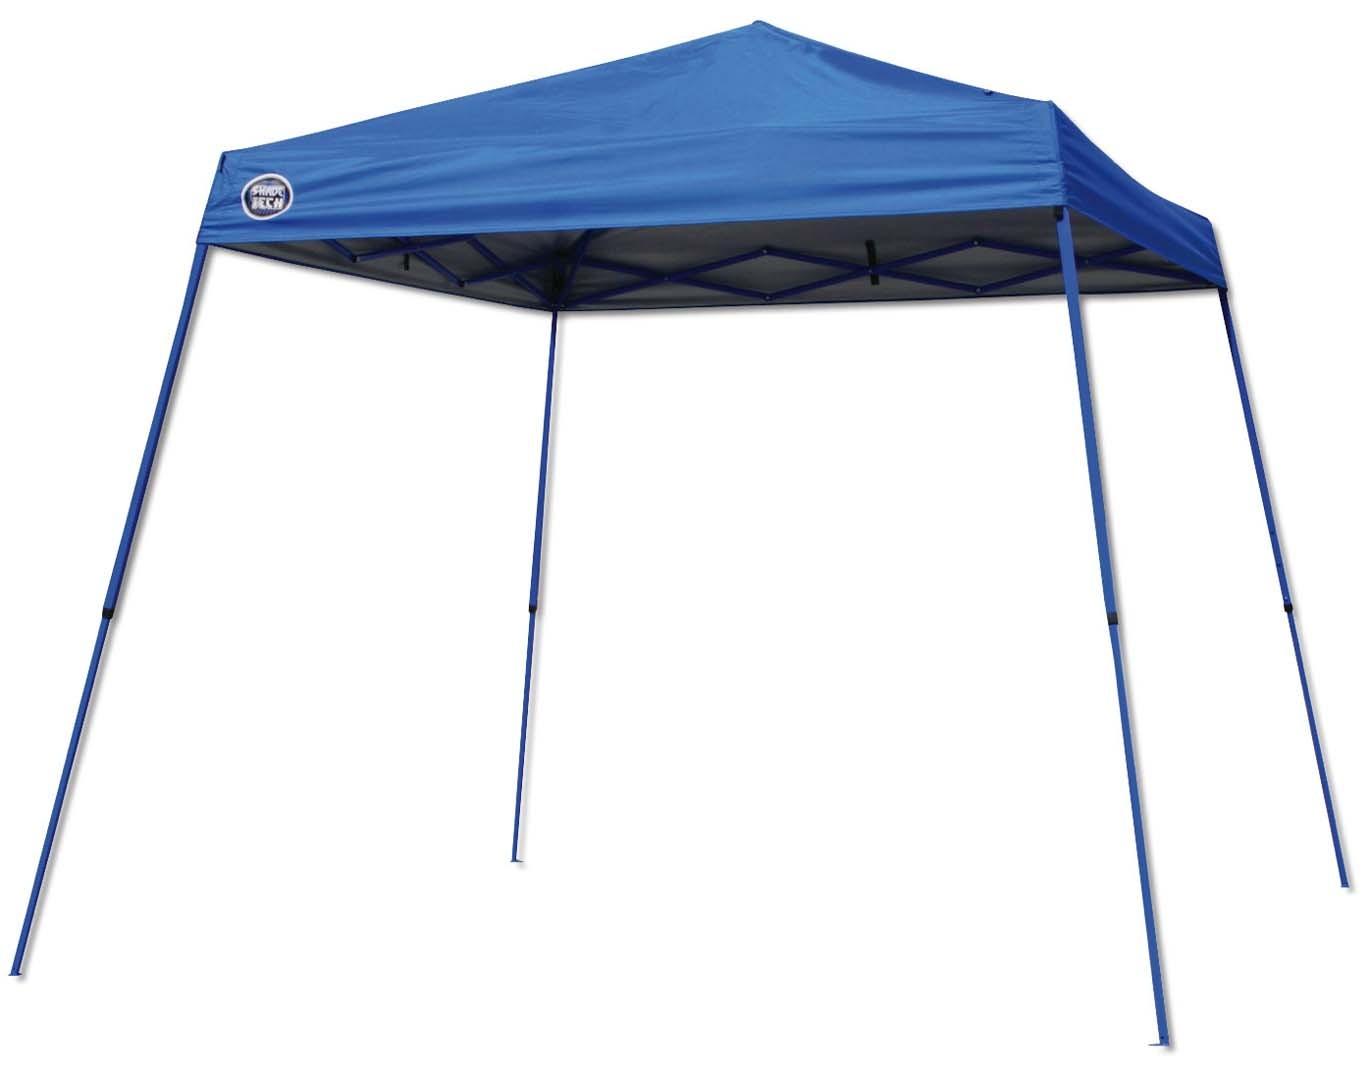 Quick Overview  sc 1 st  OnlineSports.com & 10u0027 x 10u0027 Shade Tech ST56 Instant Canopy / Tent (Blue ...